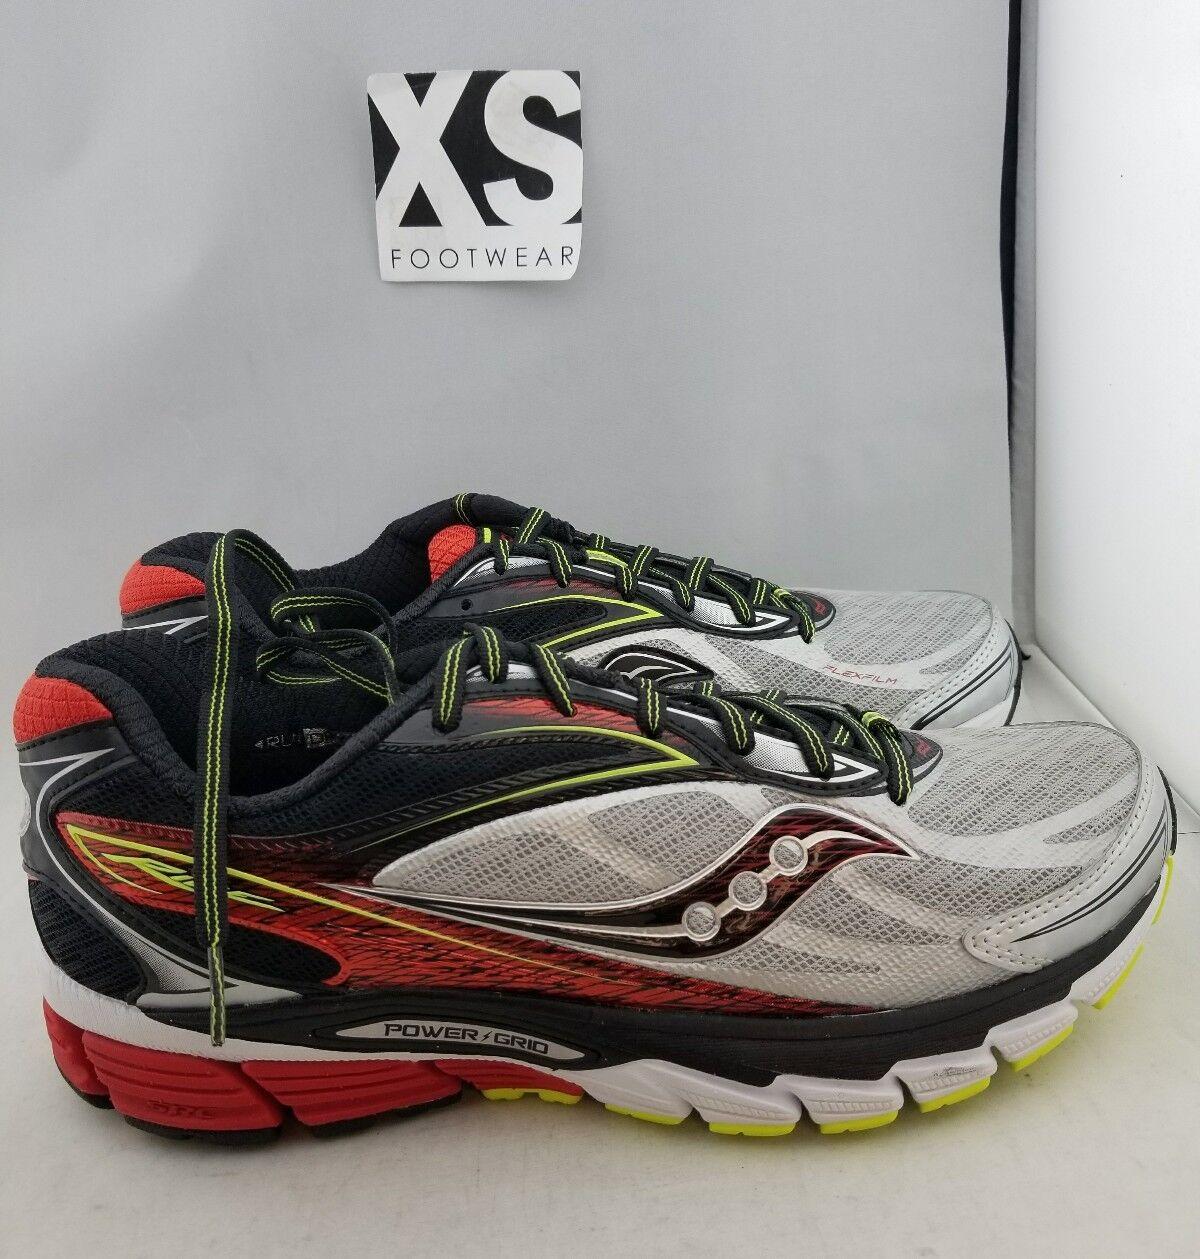 Saucony Ride 8 Running Shoe Silver, Black Red, Black Silver, Men's US 9 (I,0) 8de749